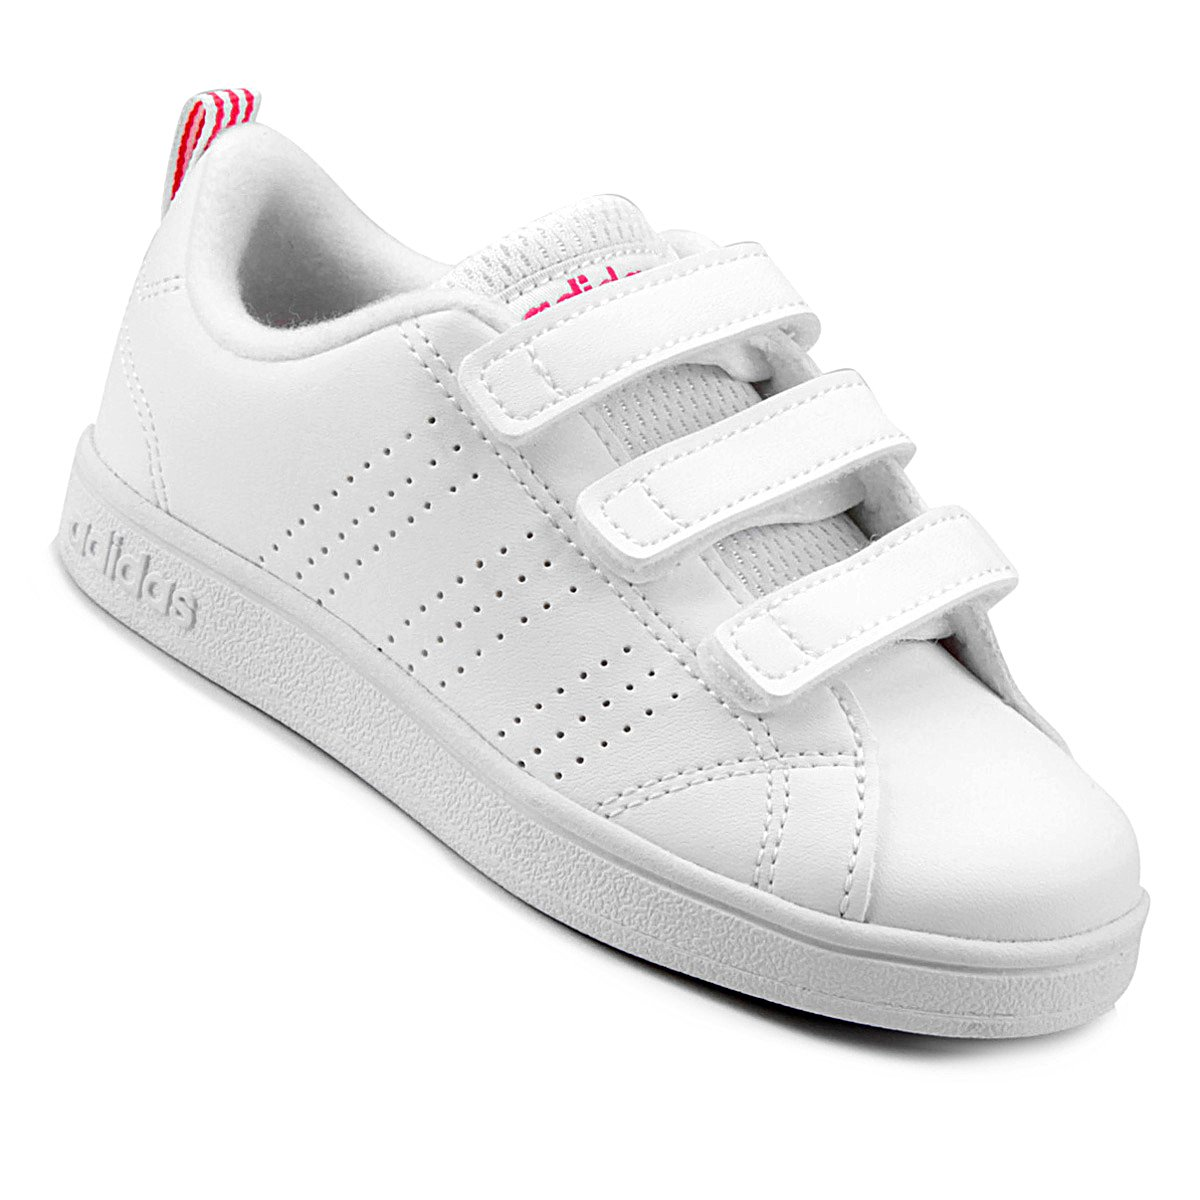 5a032d083 Tênis Infantil Adidas Vs Advantage Clean C - Branco e Rosa - Compre Agora